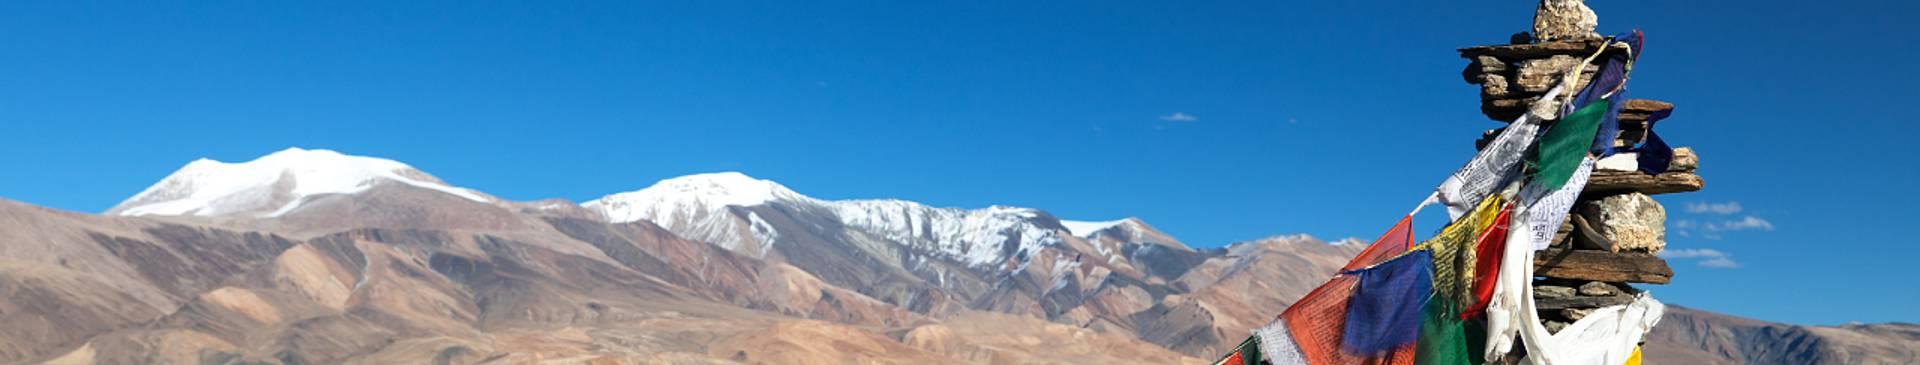 Tibet im Oktober